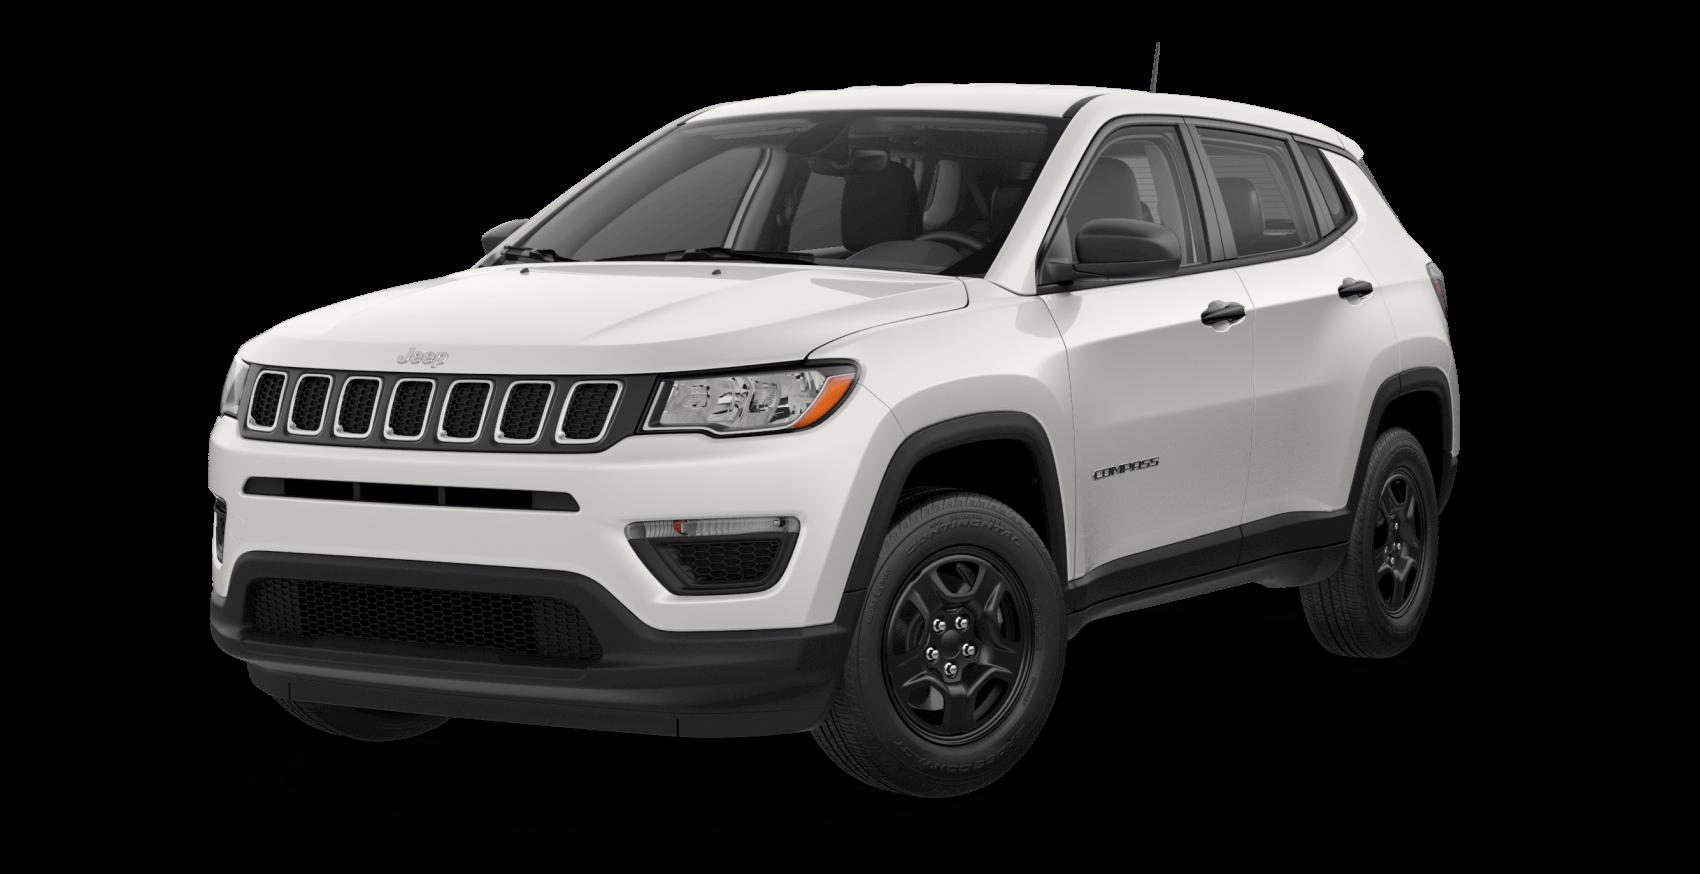 2021 Jeep Compass White